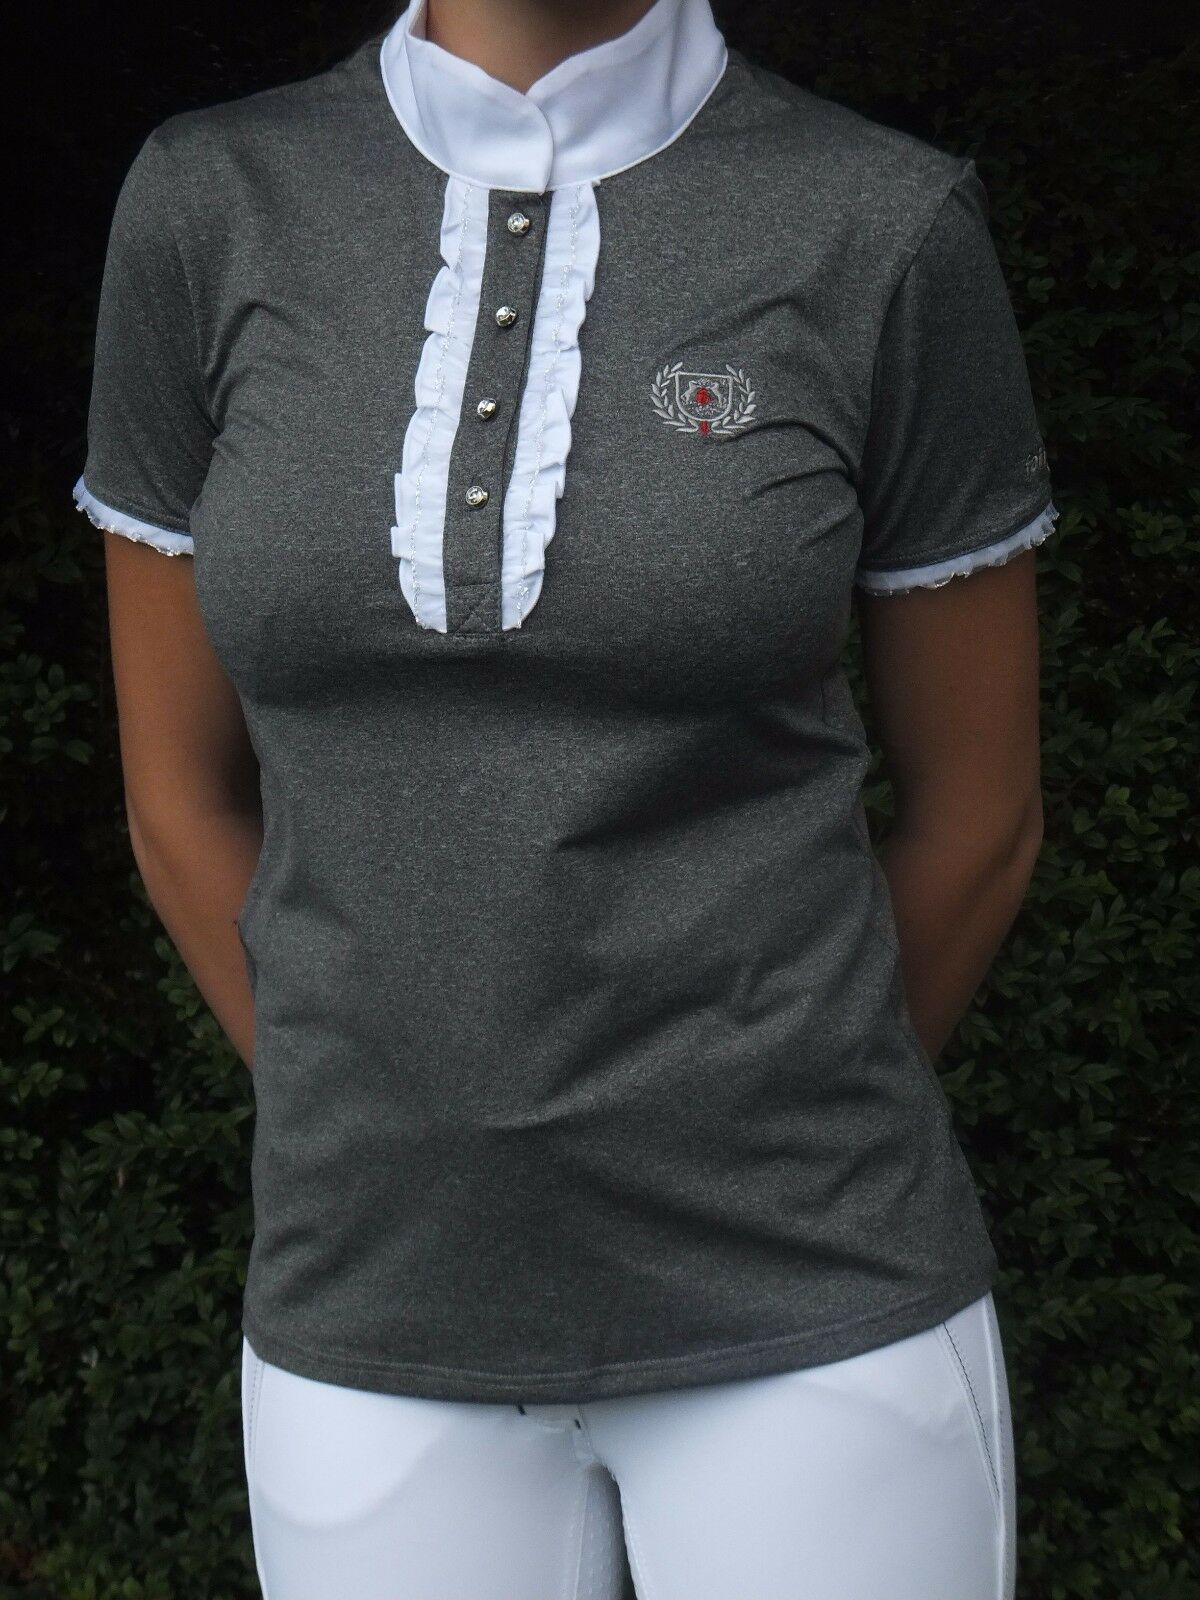 Fair Fair Fair Play Tuniershirt   Charlotte  grau weiß mit Rüschen und Glitzerdekor bc5234